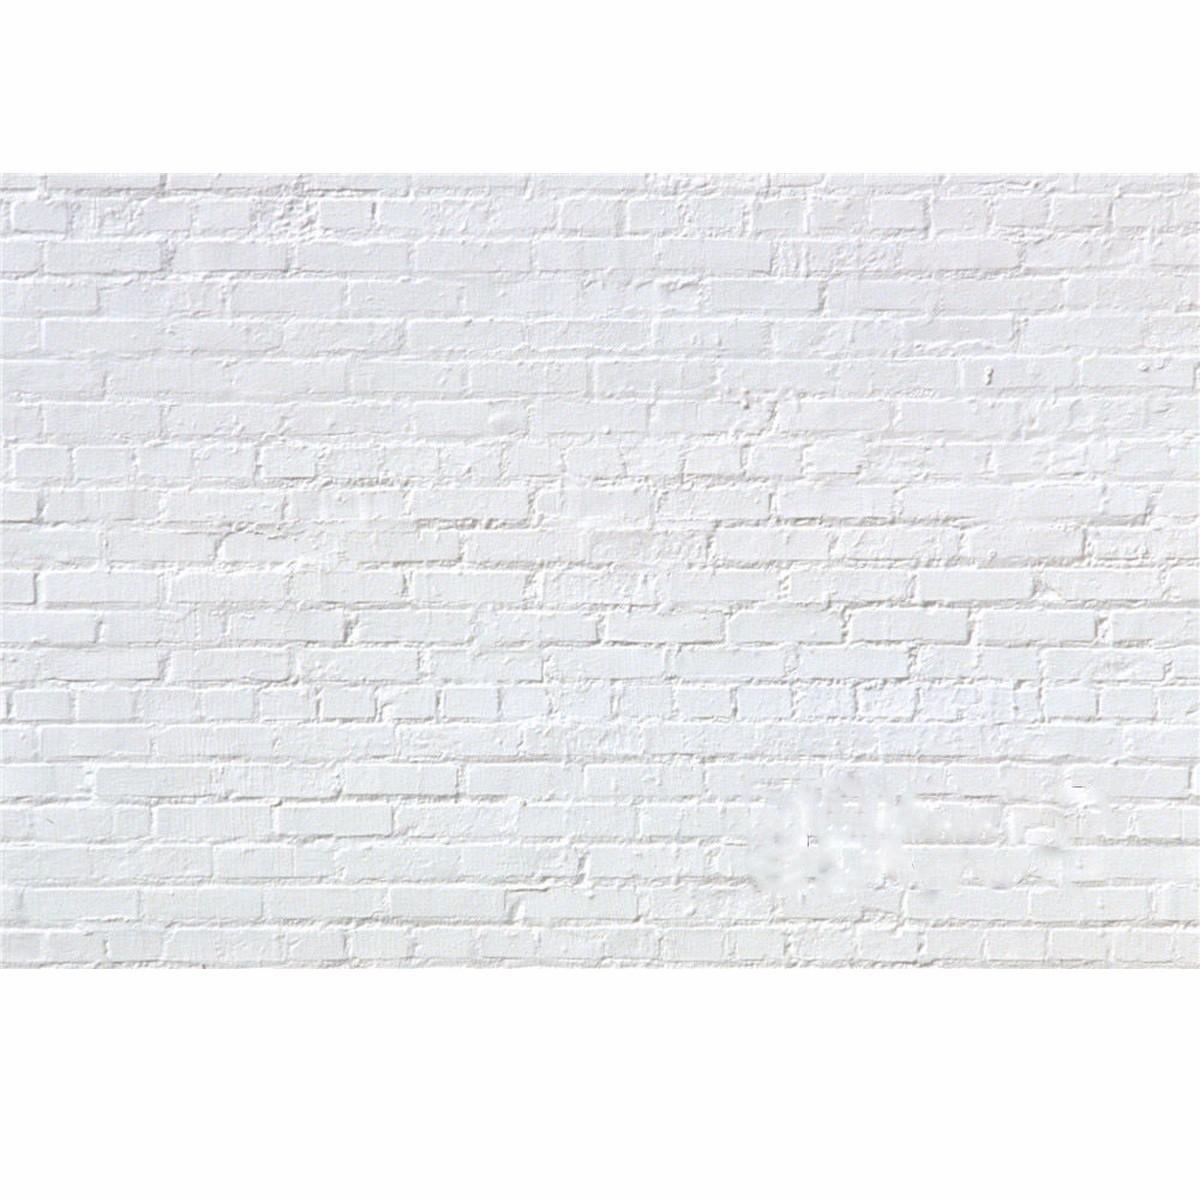 7x5FT Vinyl White Brick Wall Photography Background Backdrop Studio Photo Props